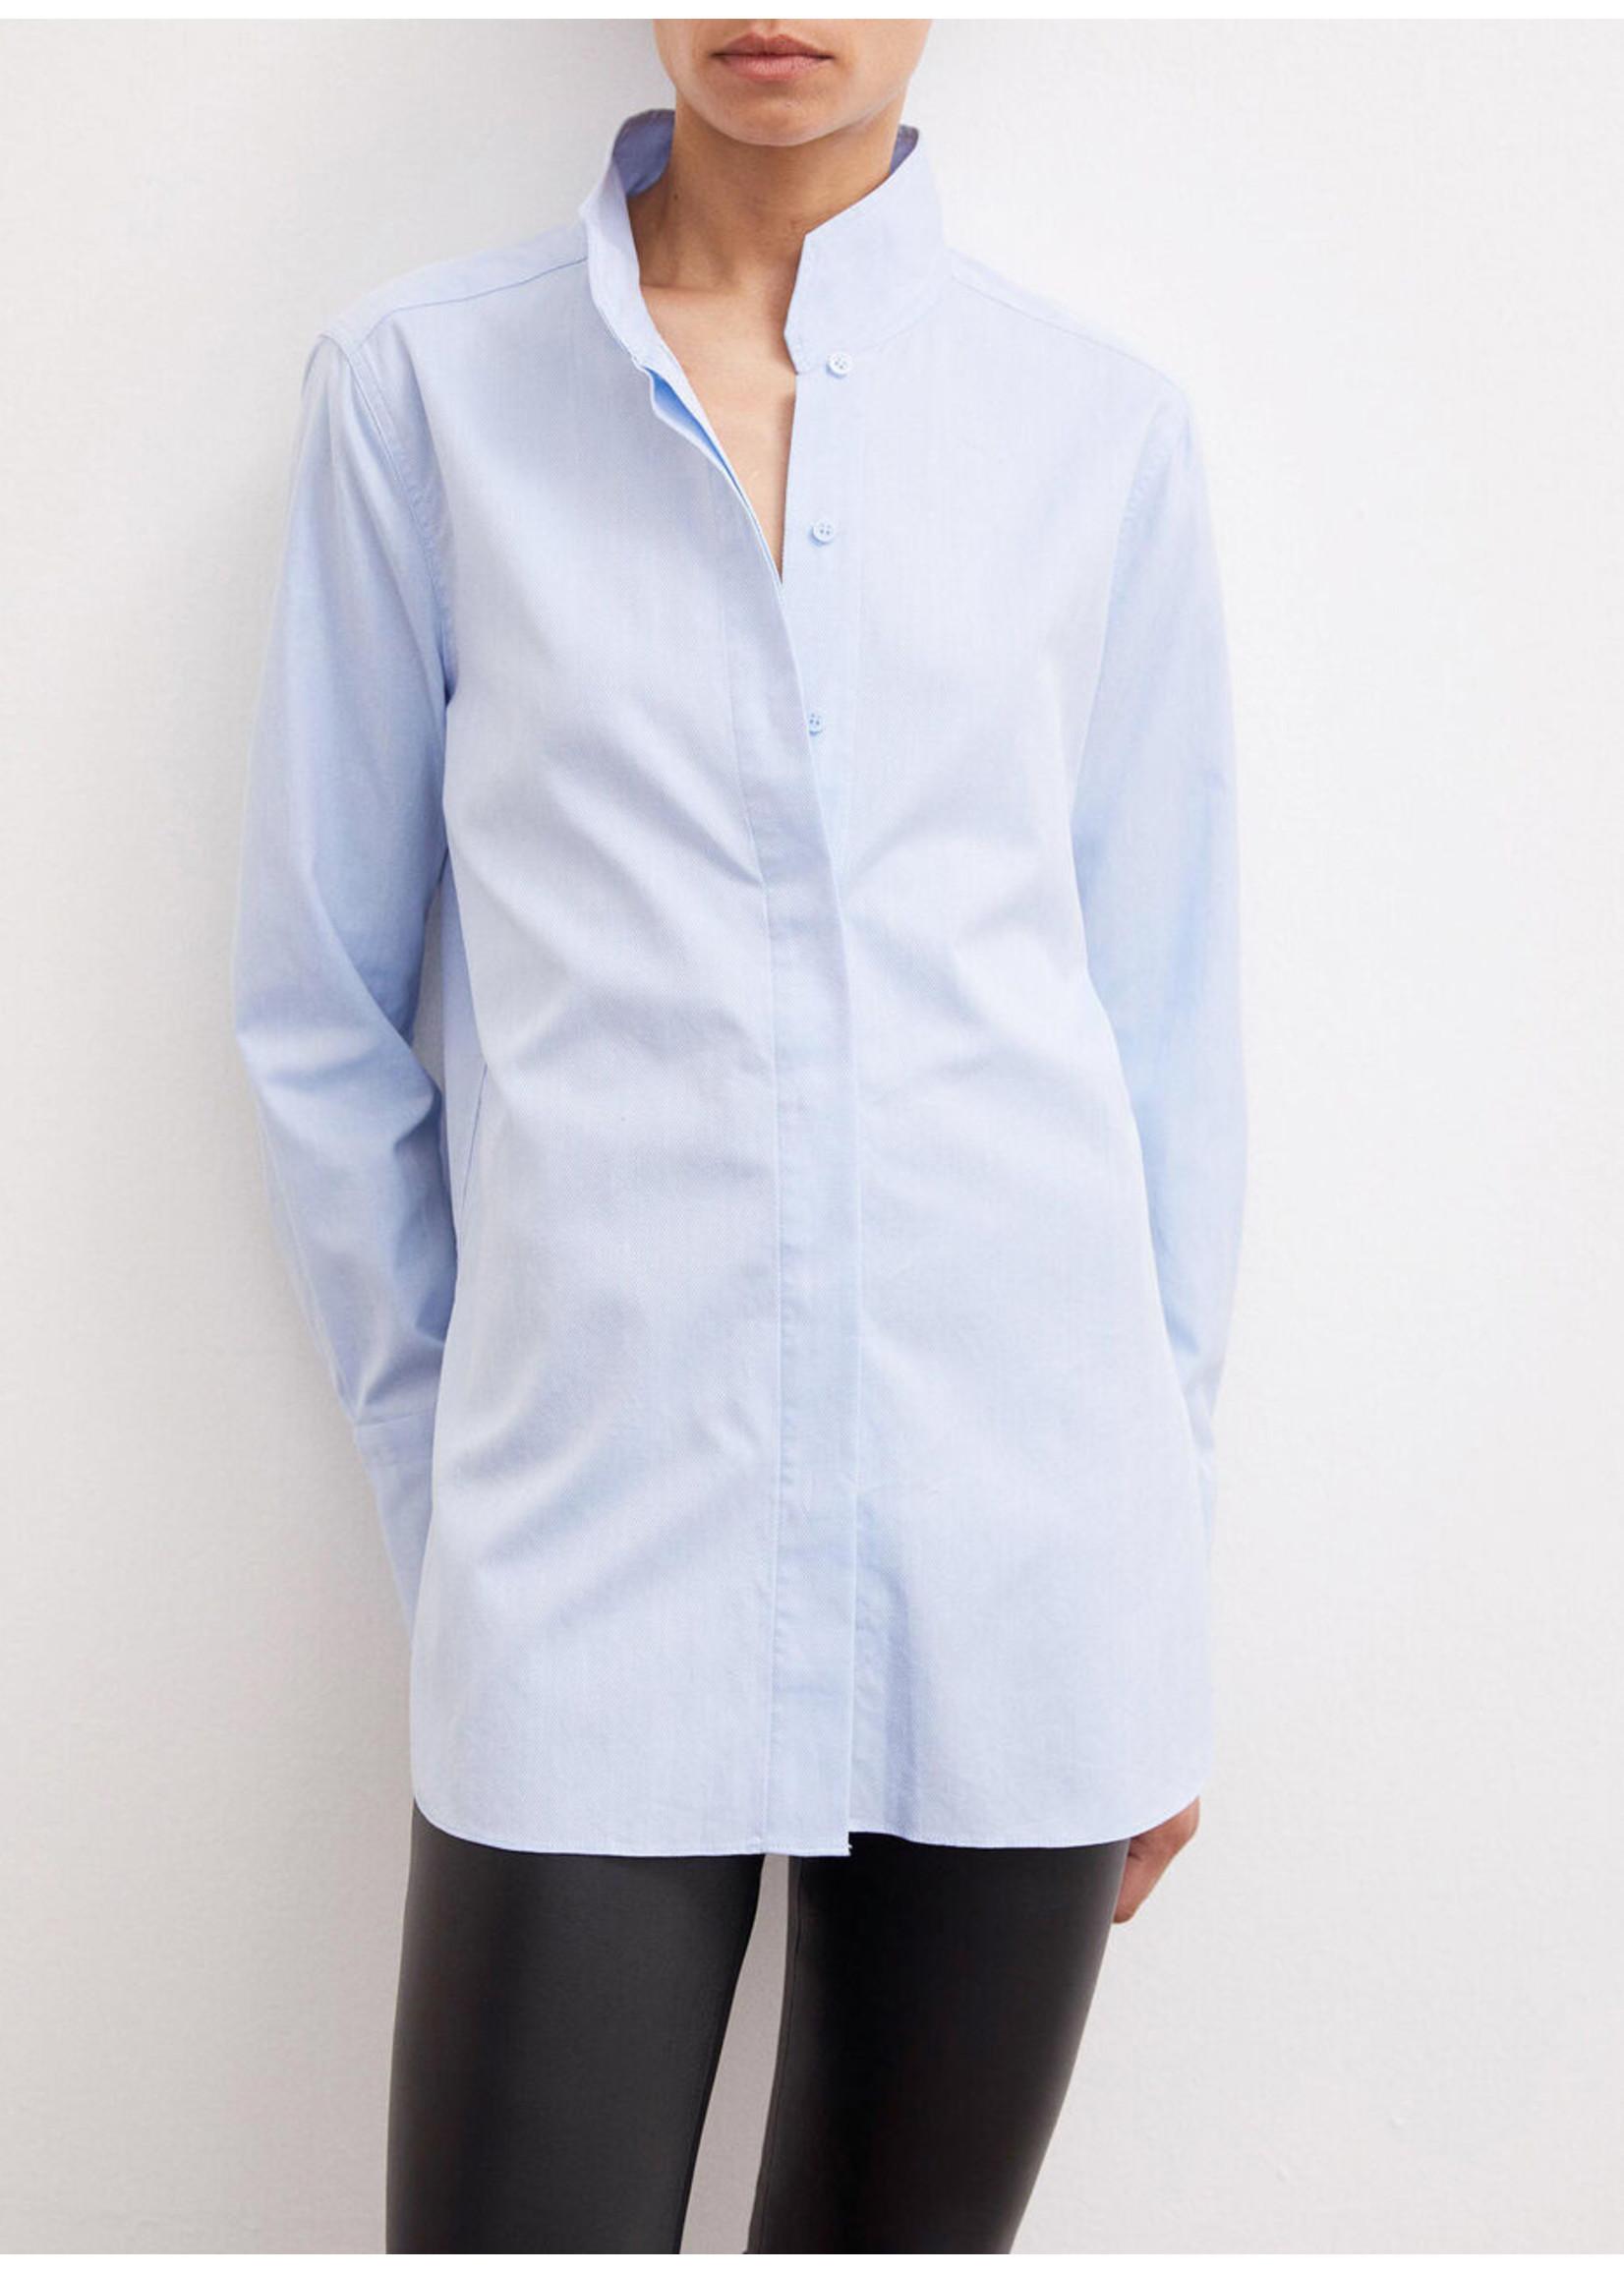 Malene Birger Leijai shirt light blue